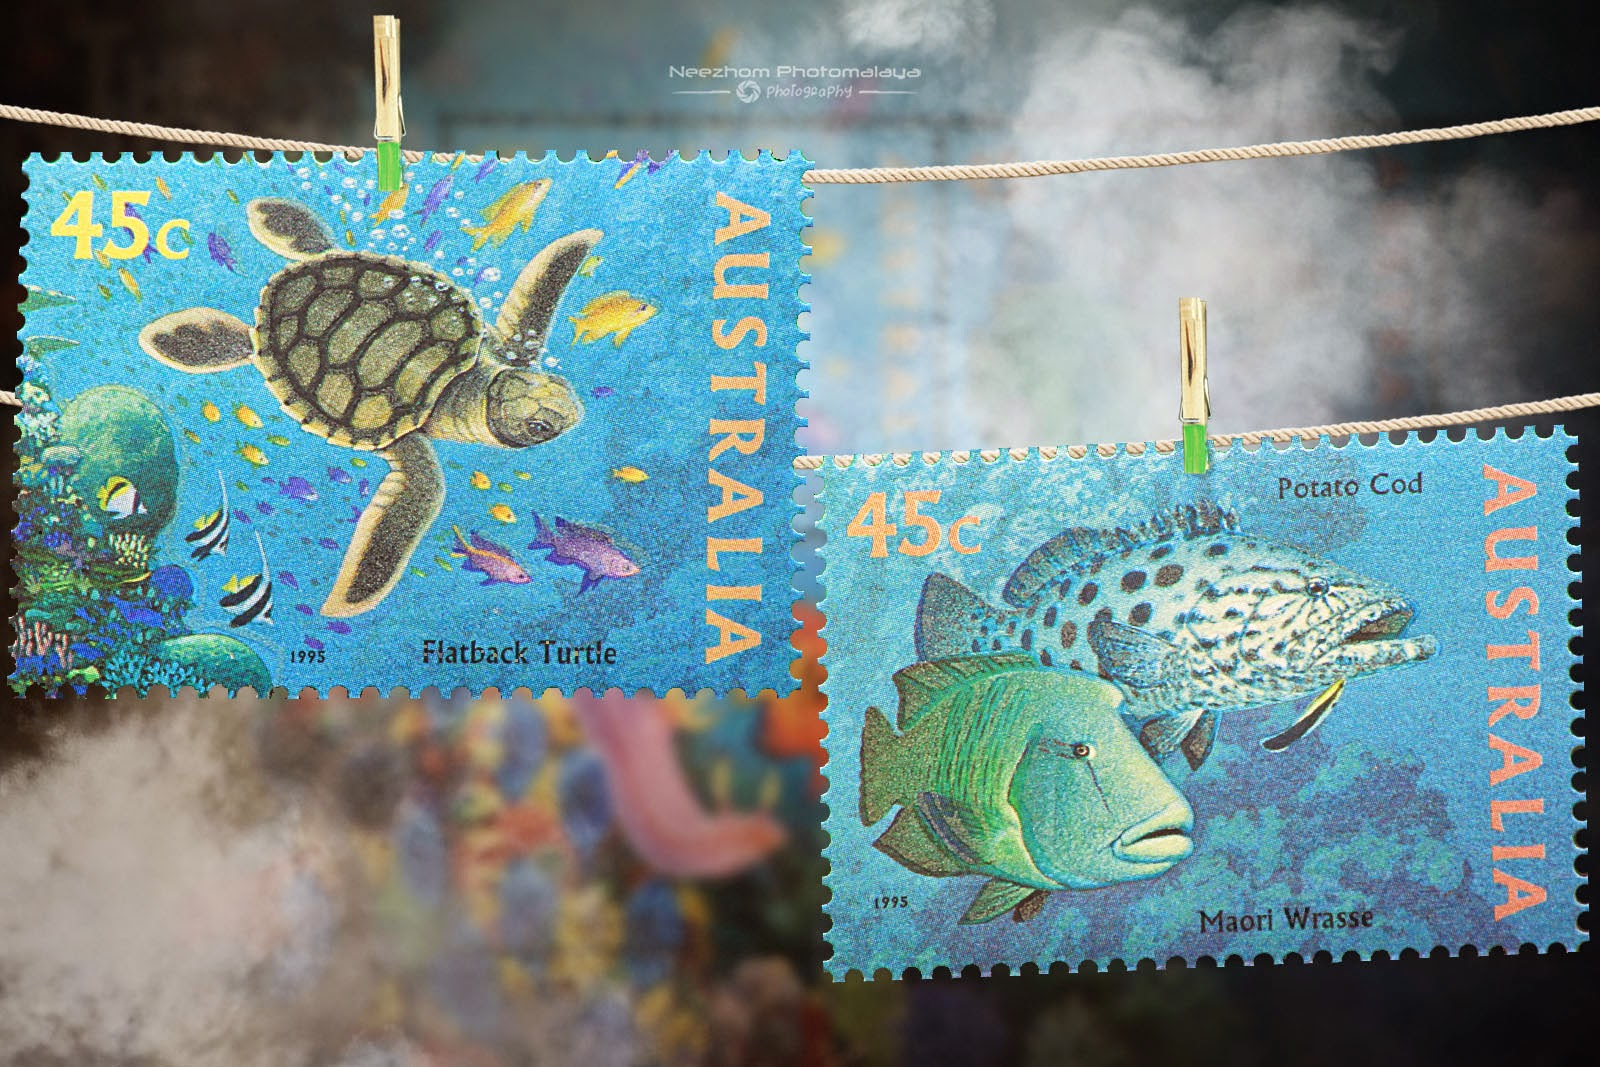 Australia 1995 The World Down Under stamps - Flatback turtle, Potato cod, Maori Wrasse